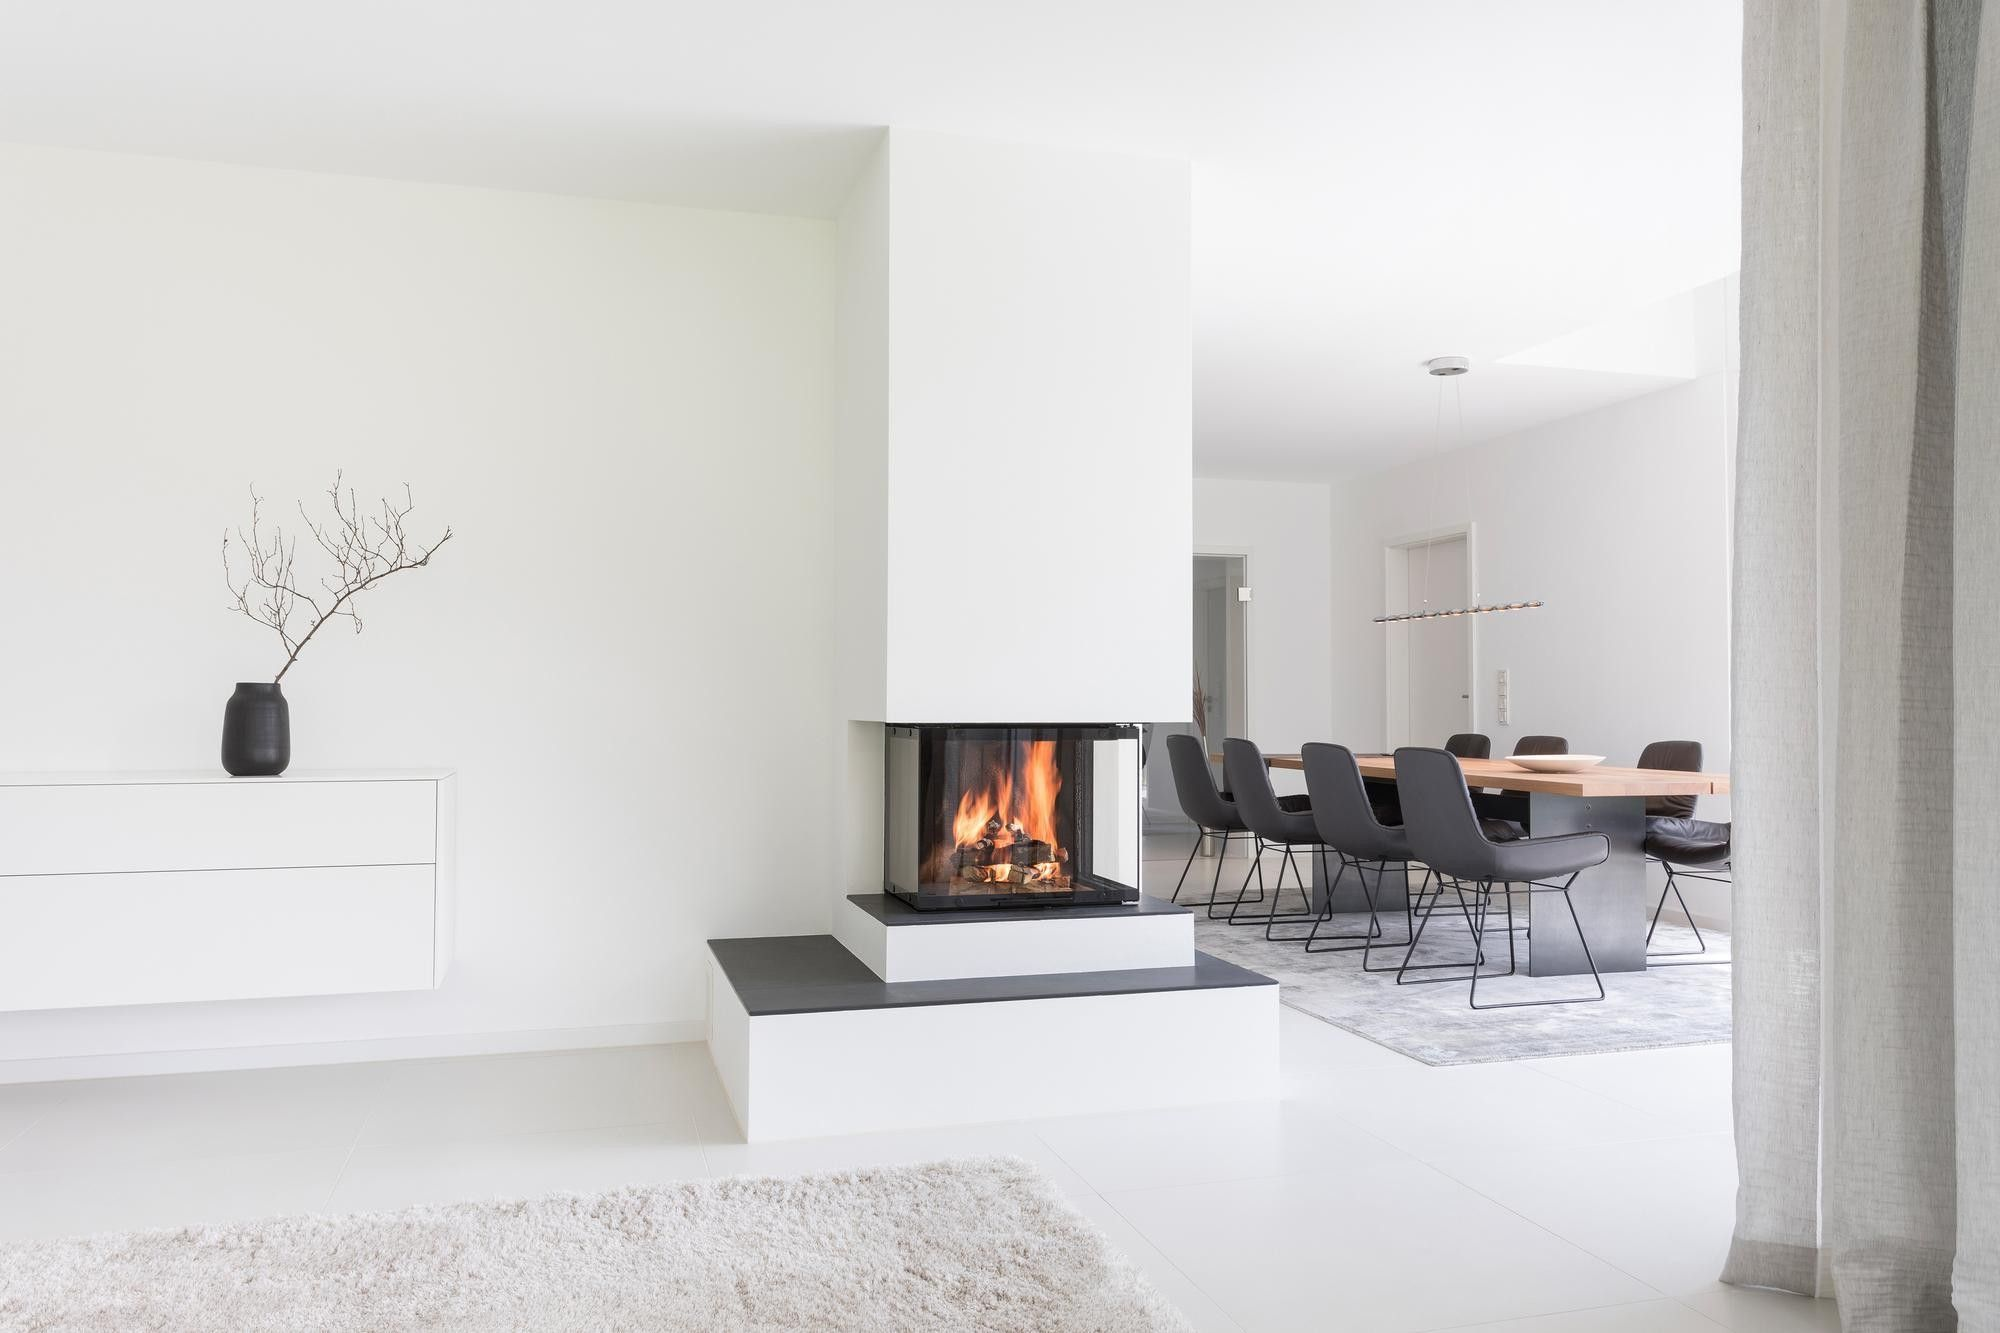 chemin es chemin e kamin ofen kamin pinterest. Black Bedroom Furniture Sets. Home Design Ideas